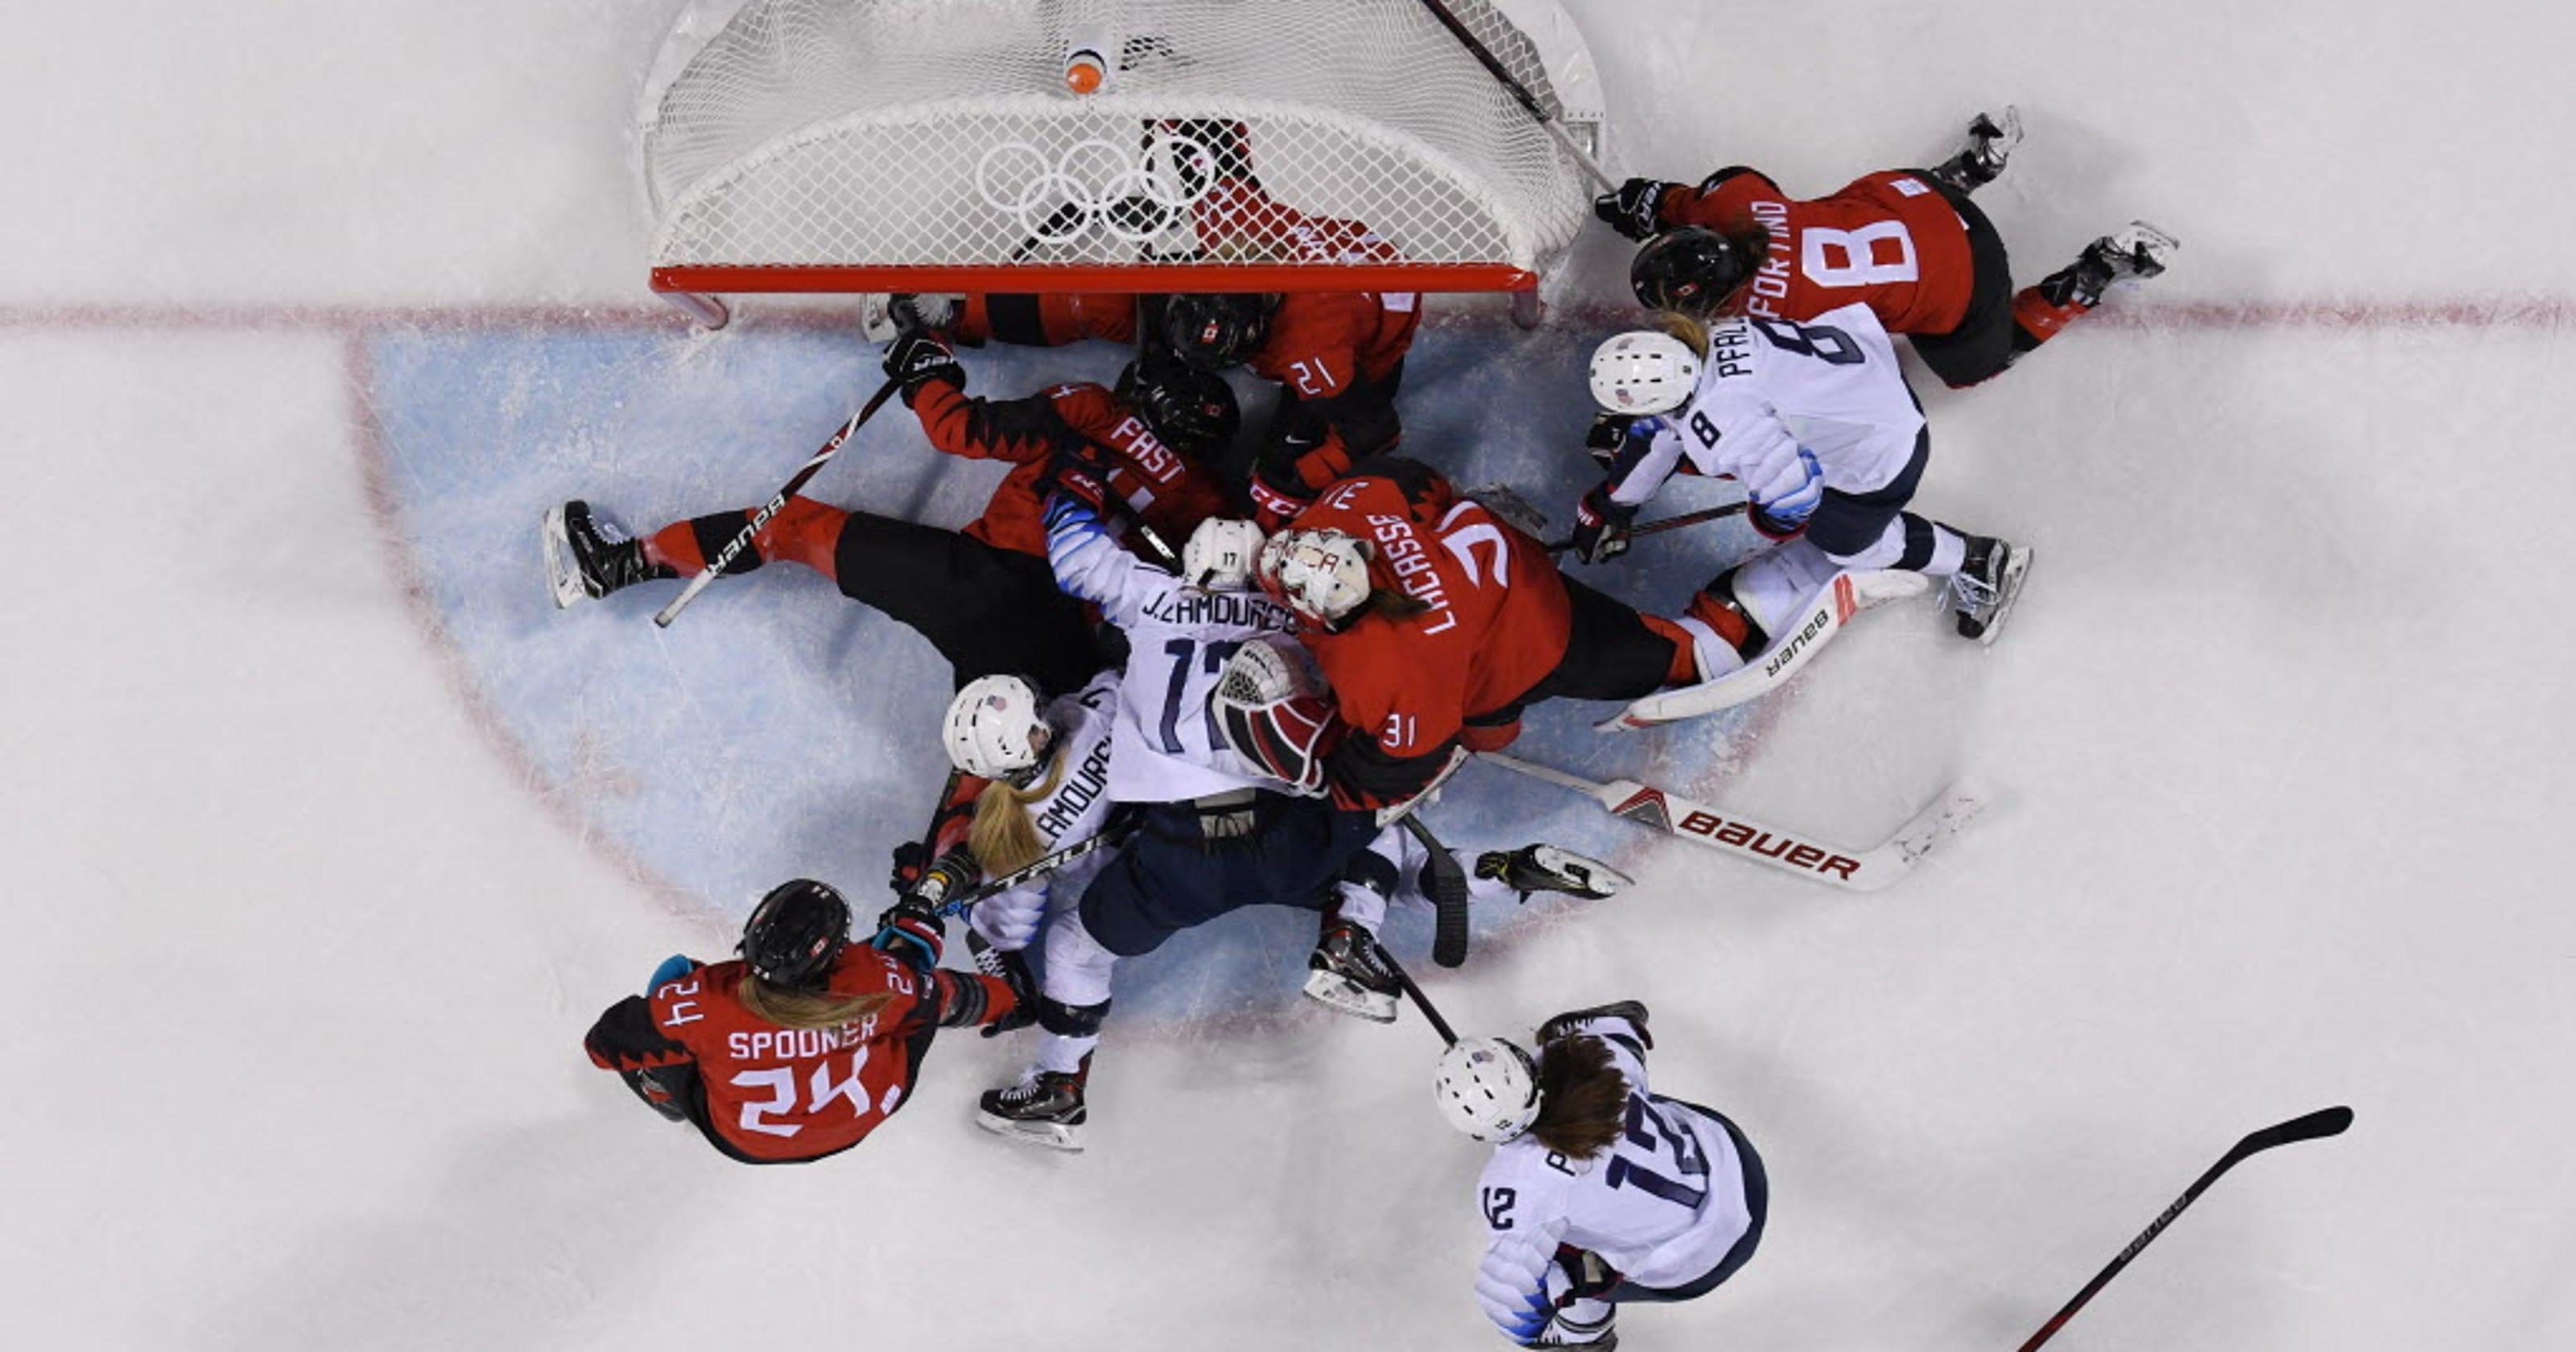 f82695eed5b Winter Olympics  Canada firmly in heads of U.S. women s hockey players